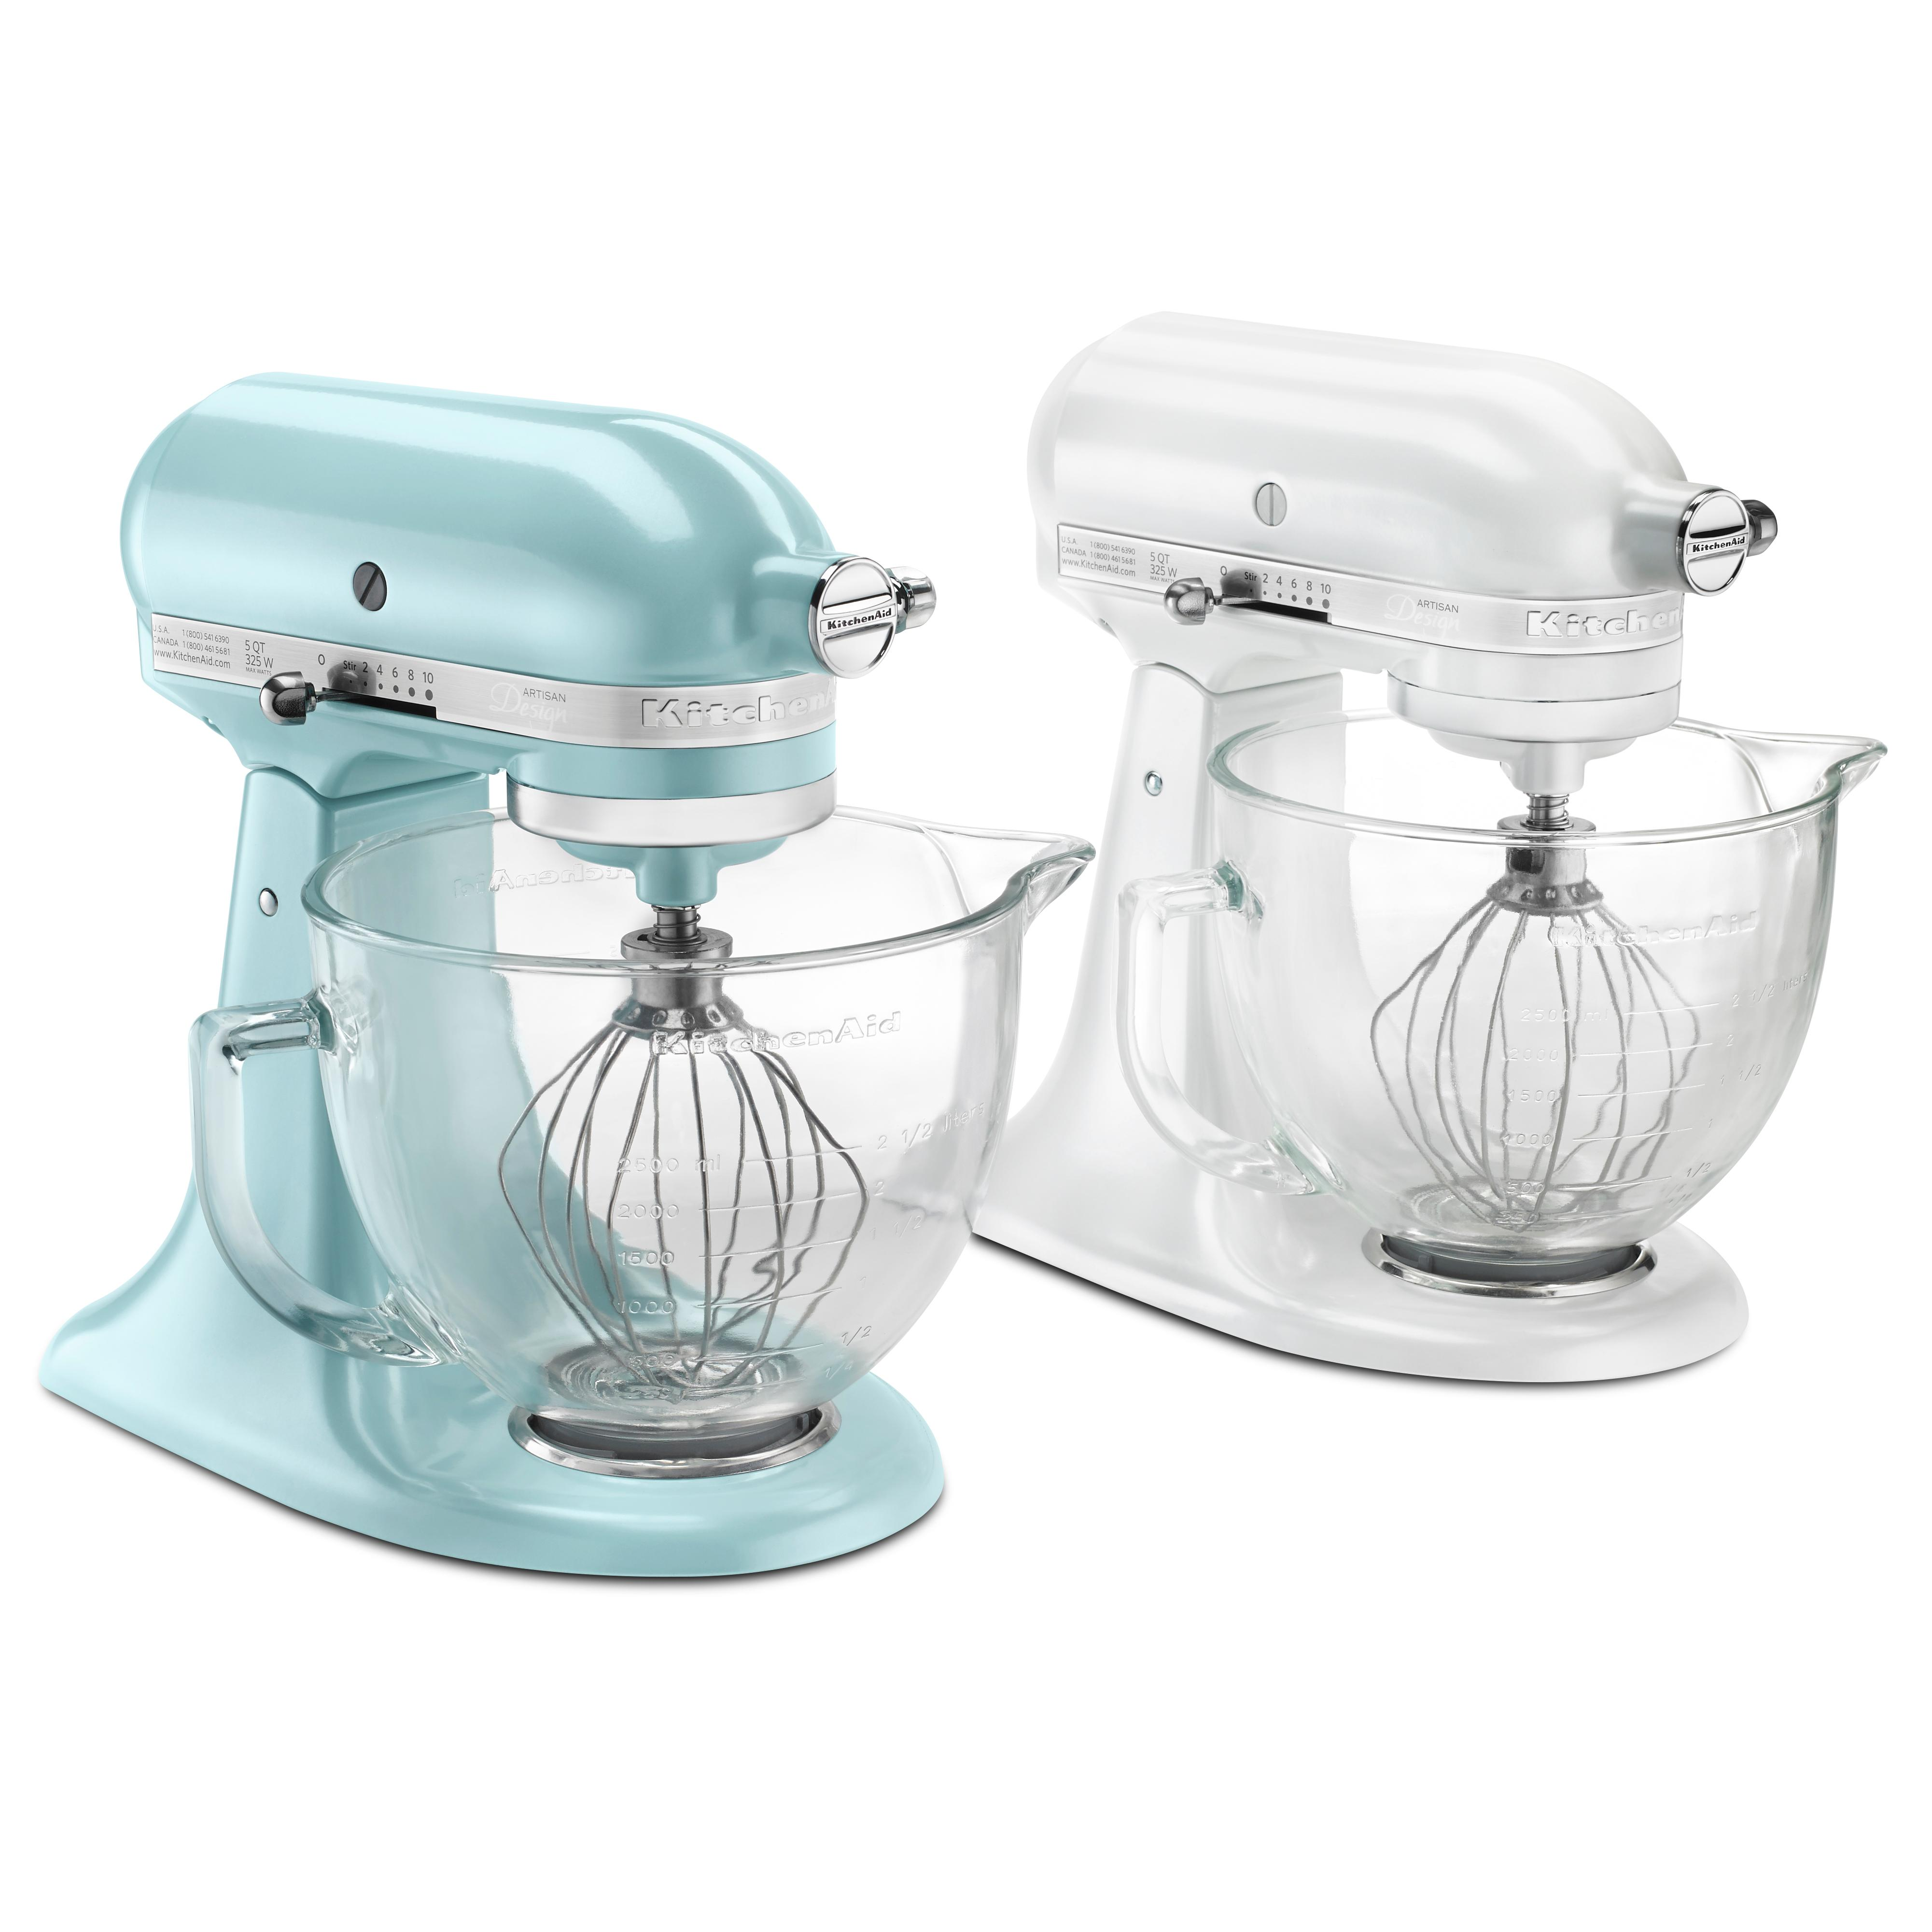 Kitchenaid Colors 2015 kitchenaid hand mixer colors | kitchen ideas